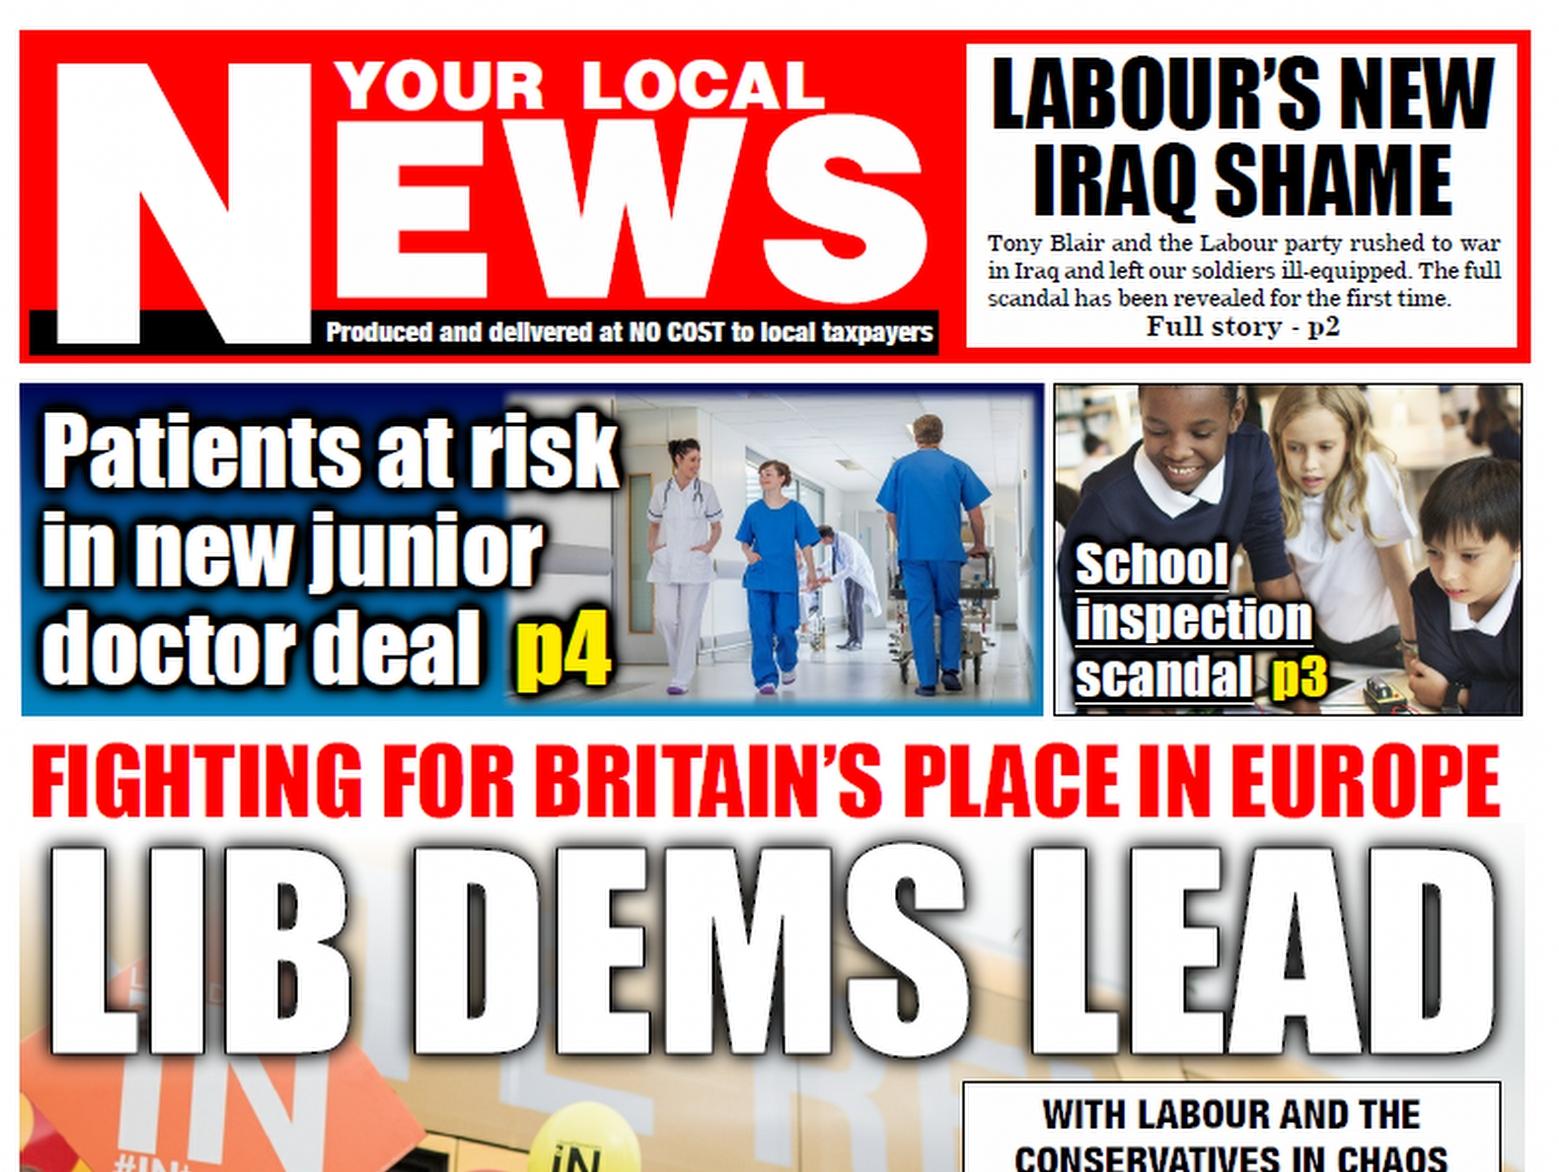 LDHQ – Post- Referendum Tabloid Templates